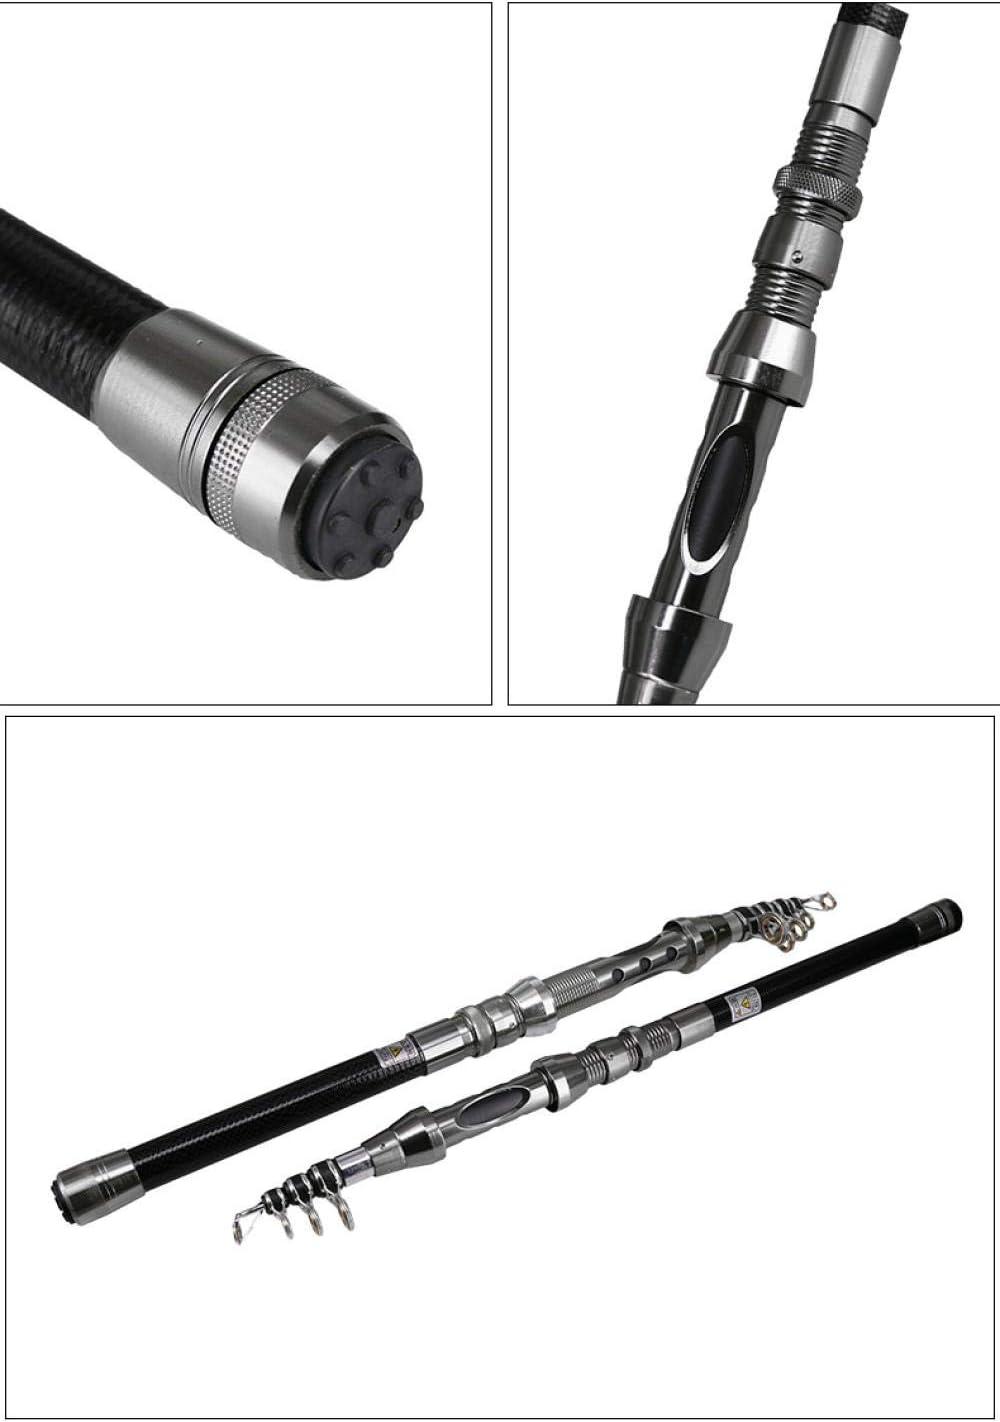 Ajcwhml High Carbon Fiber Telescopic Fishing Rod Portable Fishing Rod Travel Sea Boat Rock Fishing Rod